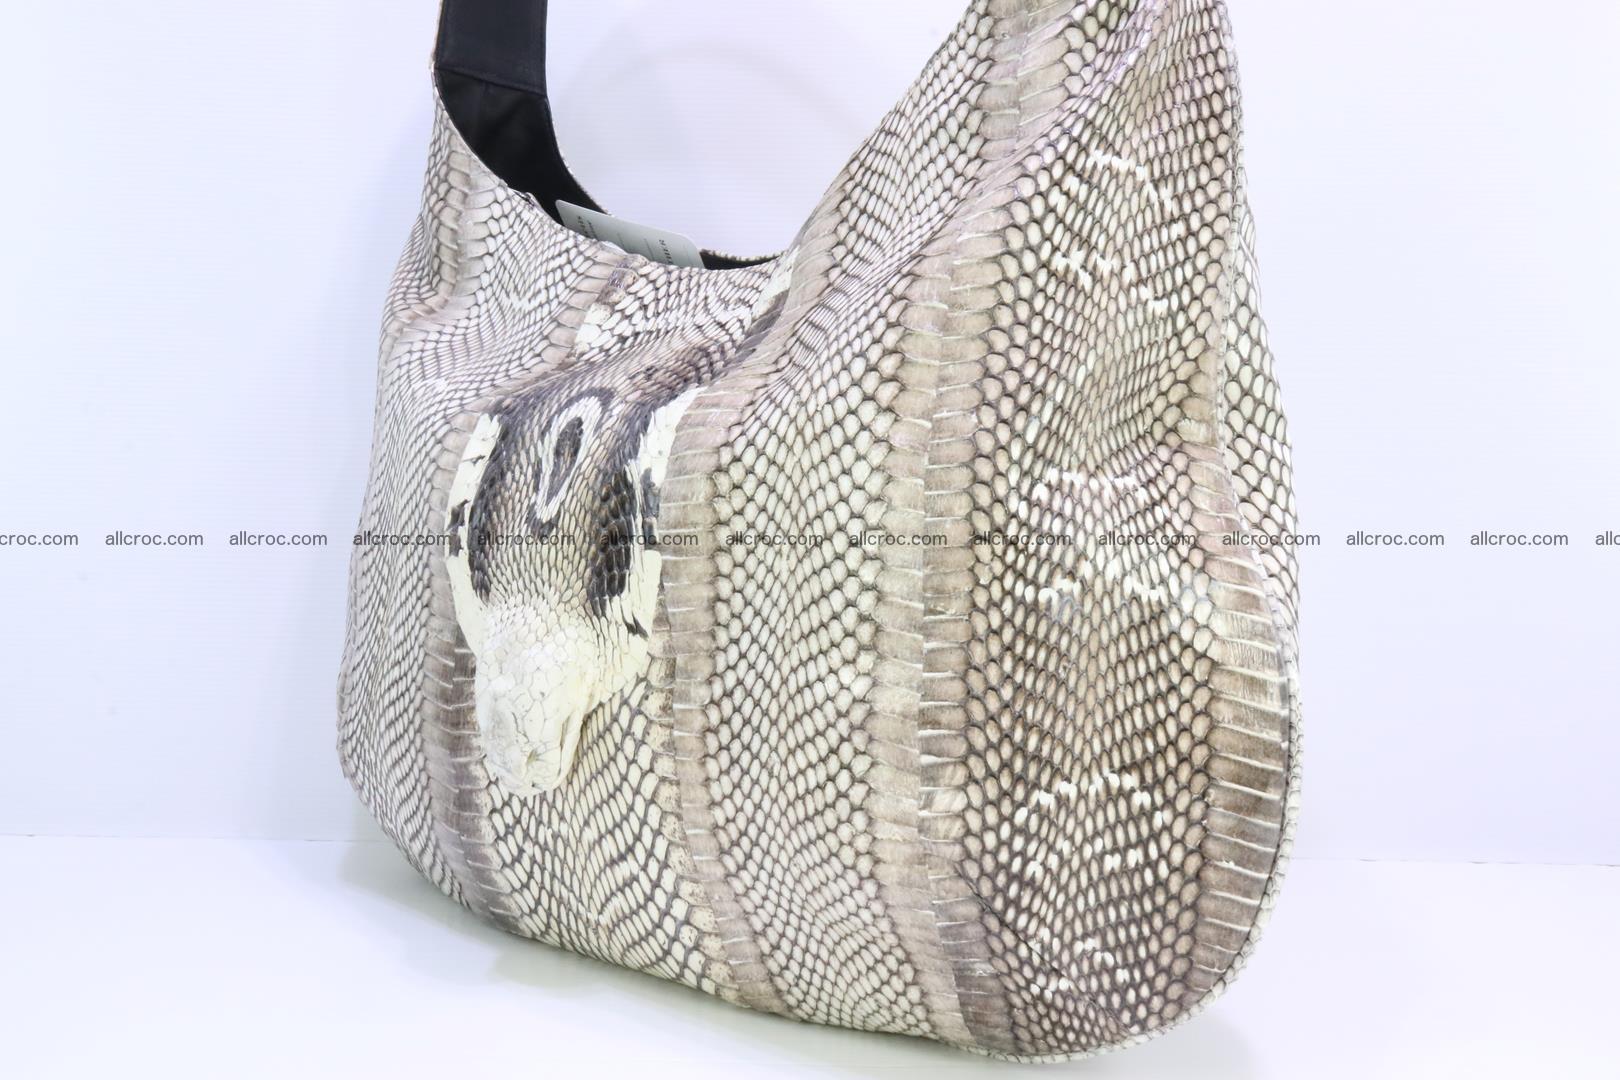 Cobra skin ladies handbag with head of cobra 194 Foto 4